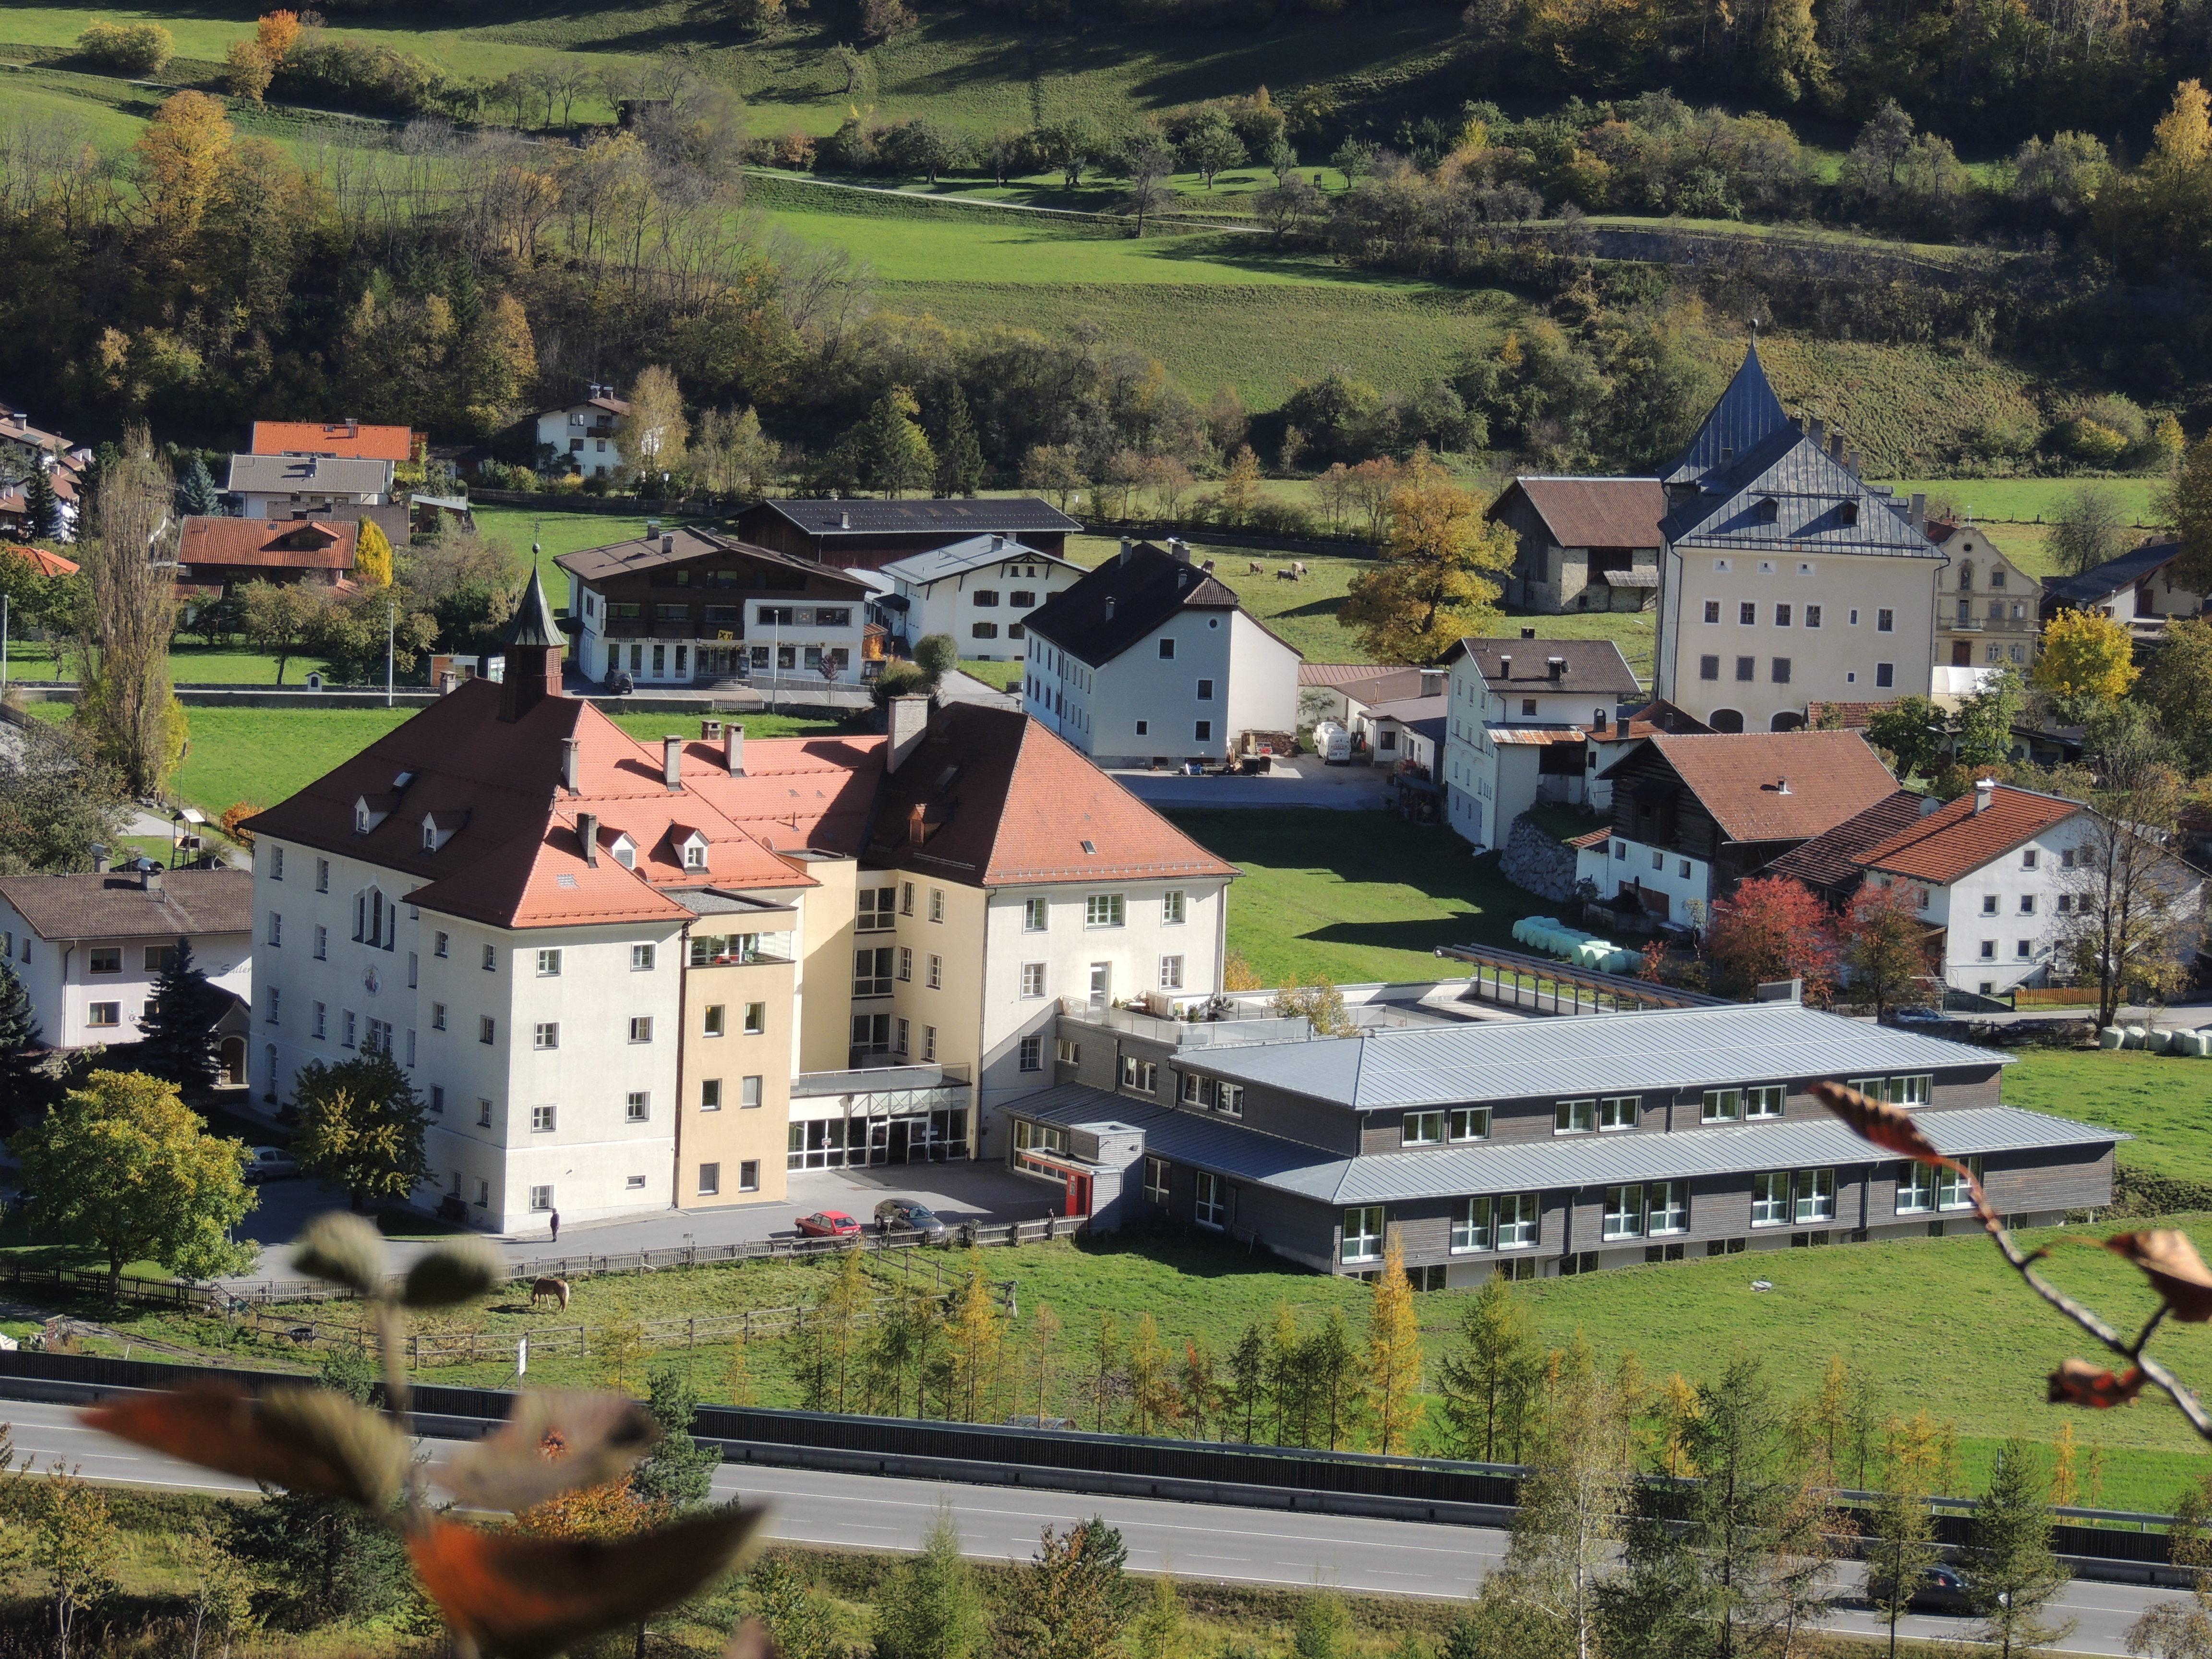 Ried im Oberinntal 1, 6531 Ried im Oberinntal, Österreich